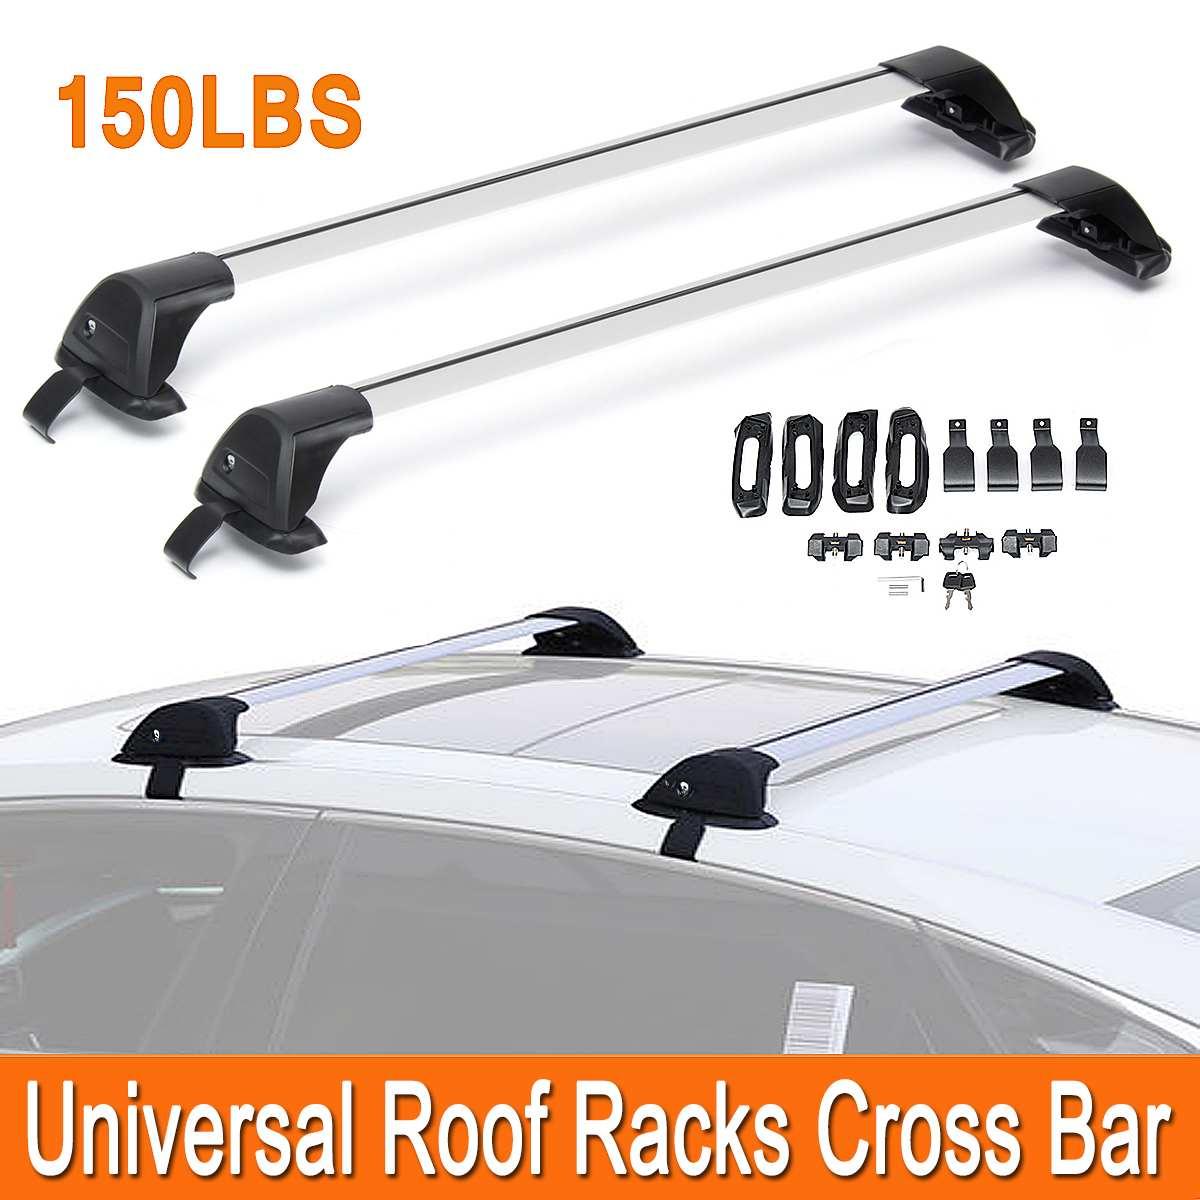 Aero Fit Roof Rack Space Bars Rails for NISSAN Leaf 5 Door 10 Menabo M-Way